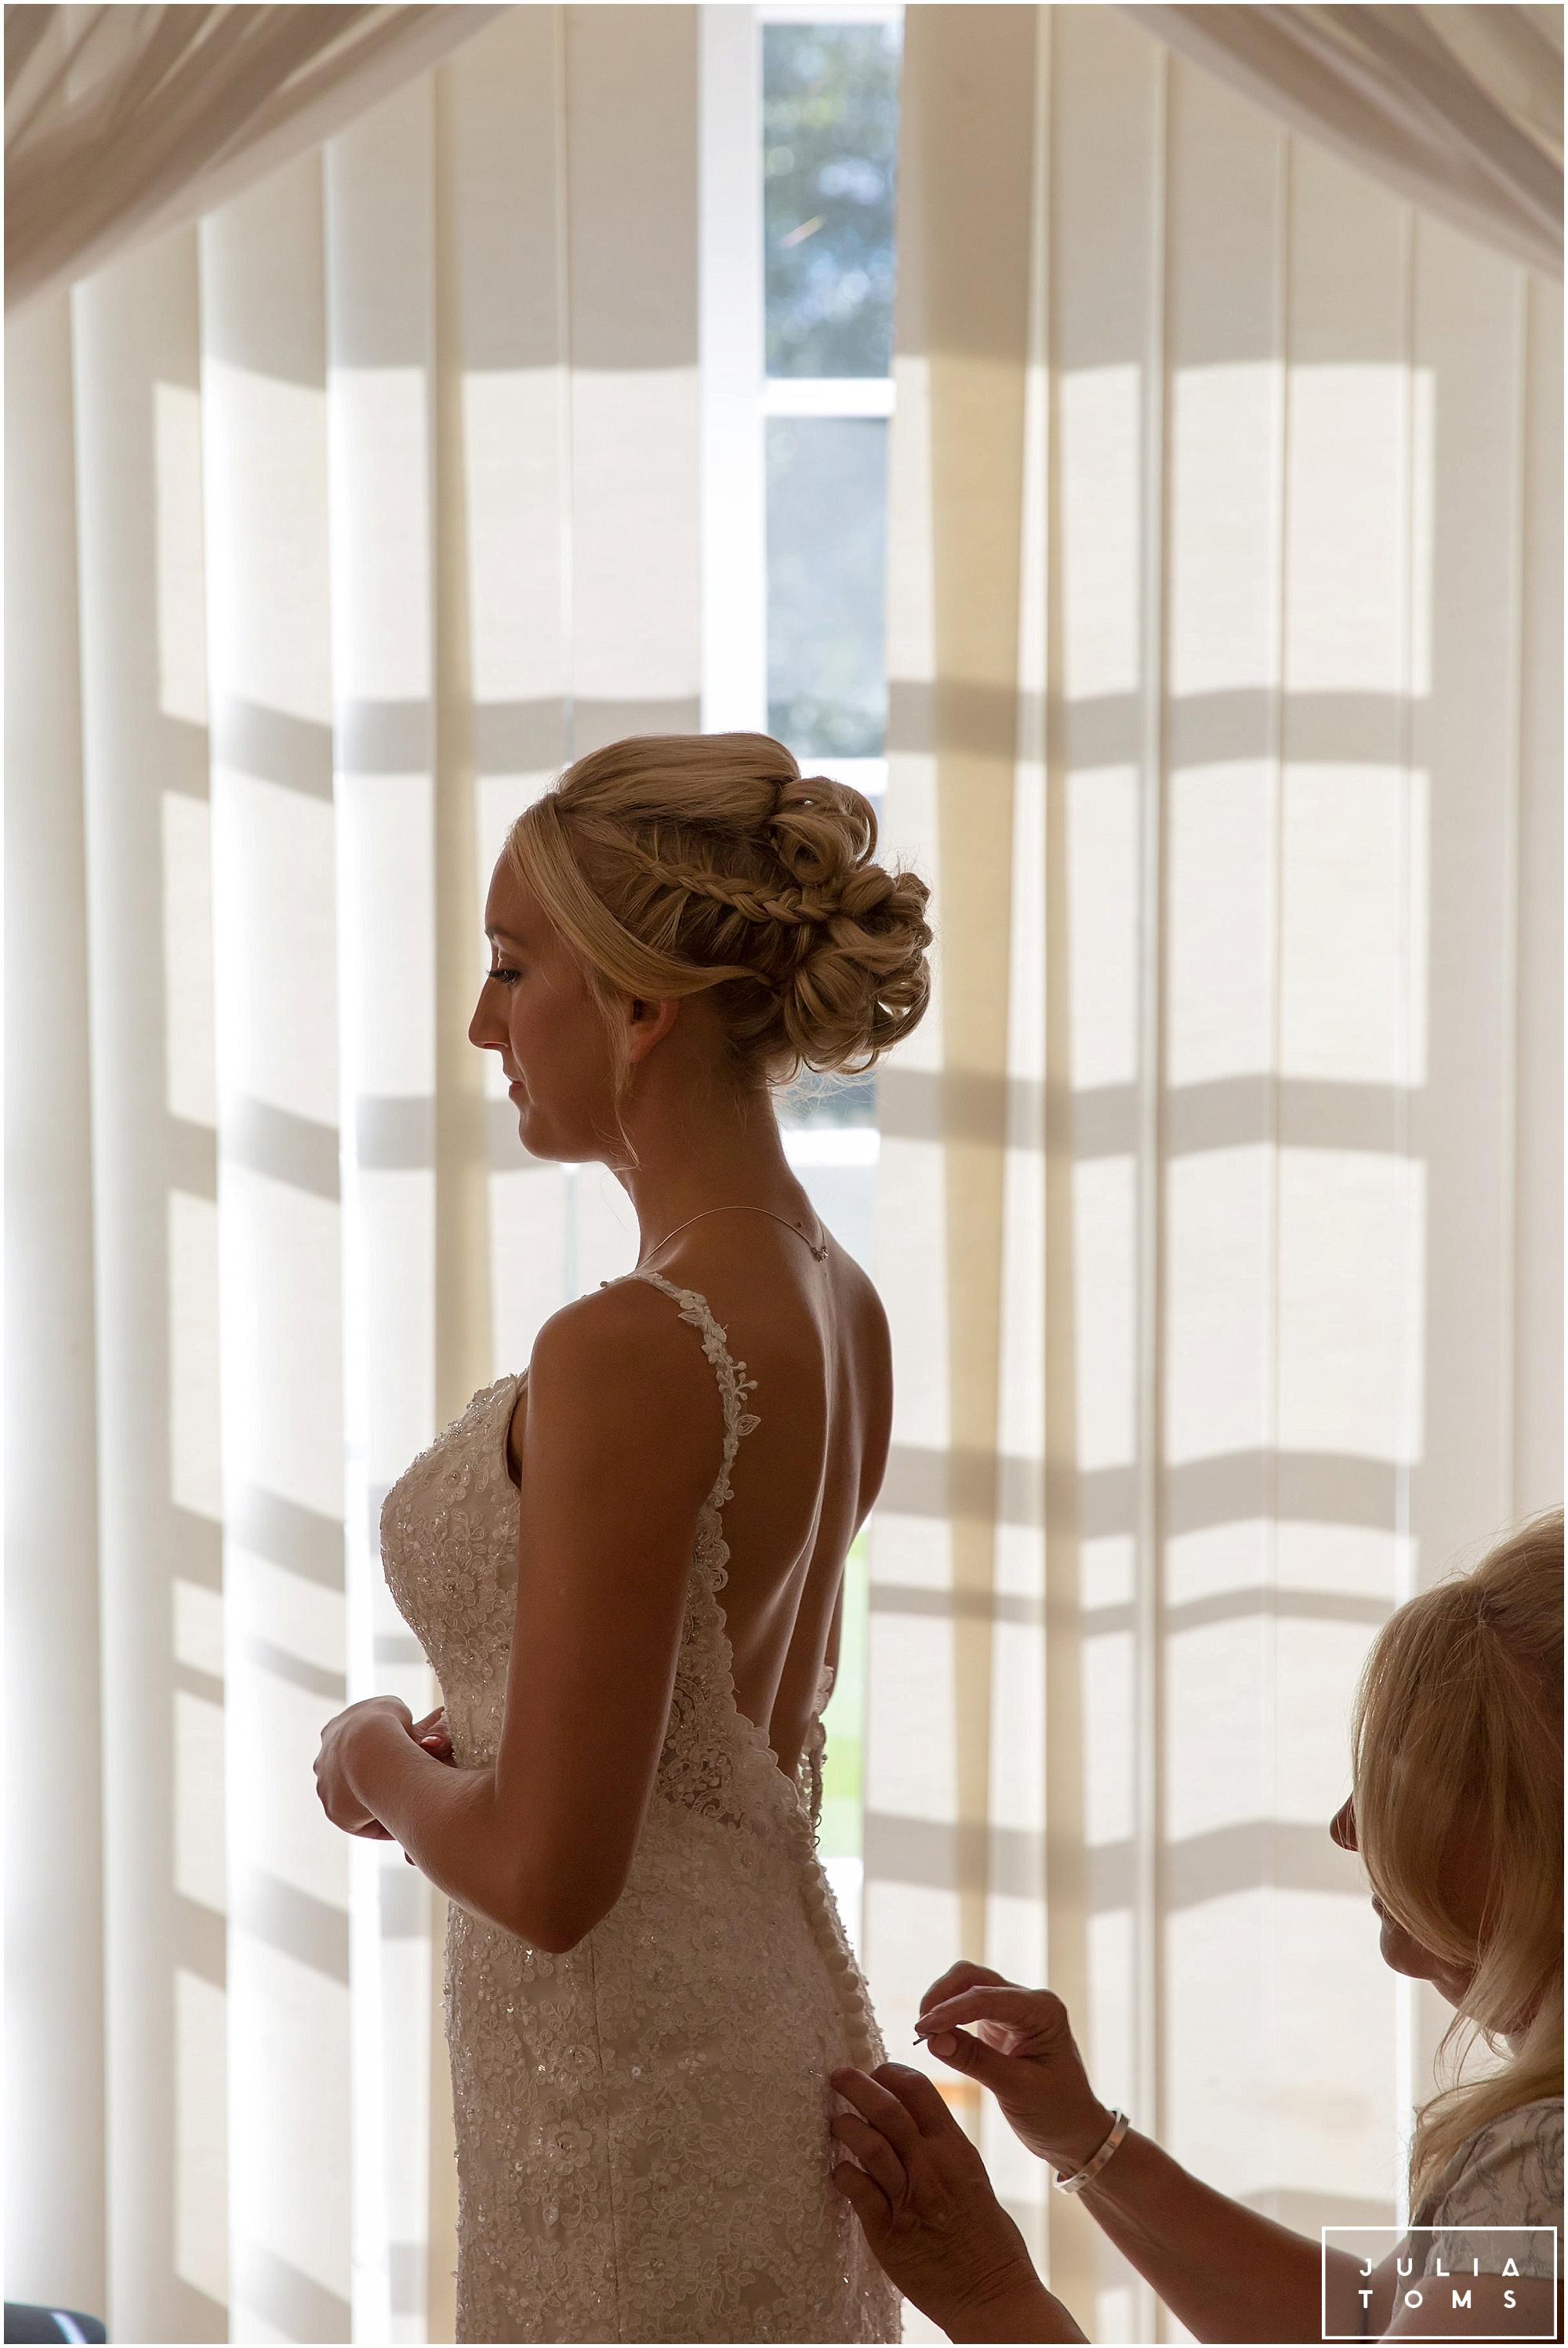 julia_toms_chichester_wedding_photographer_worthing_005.jpg